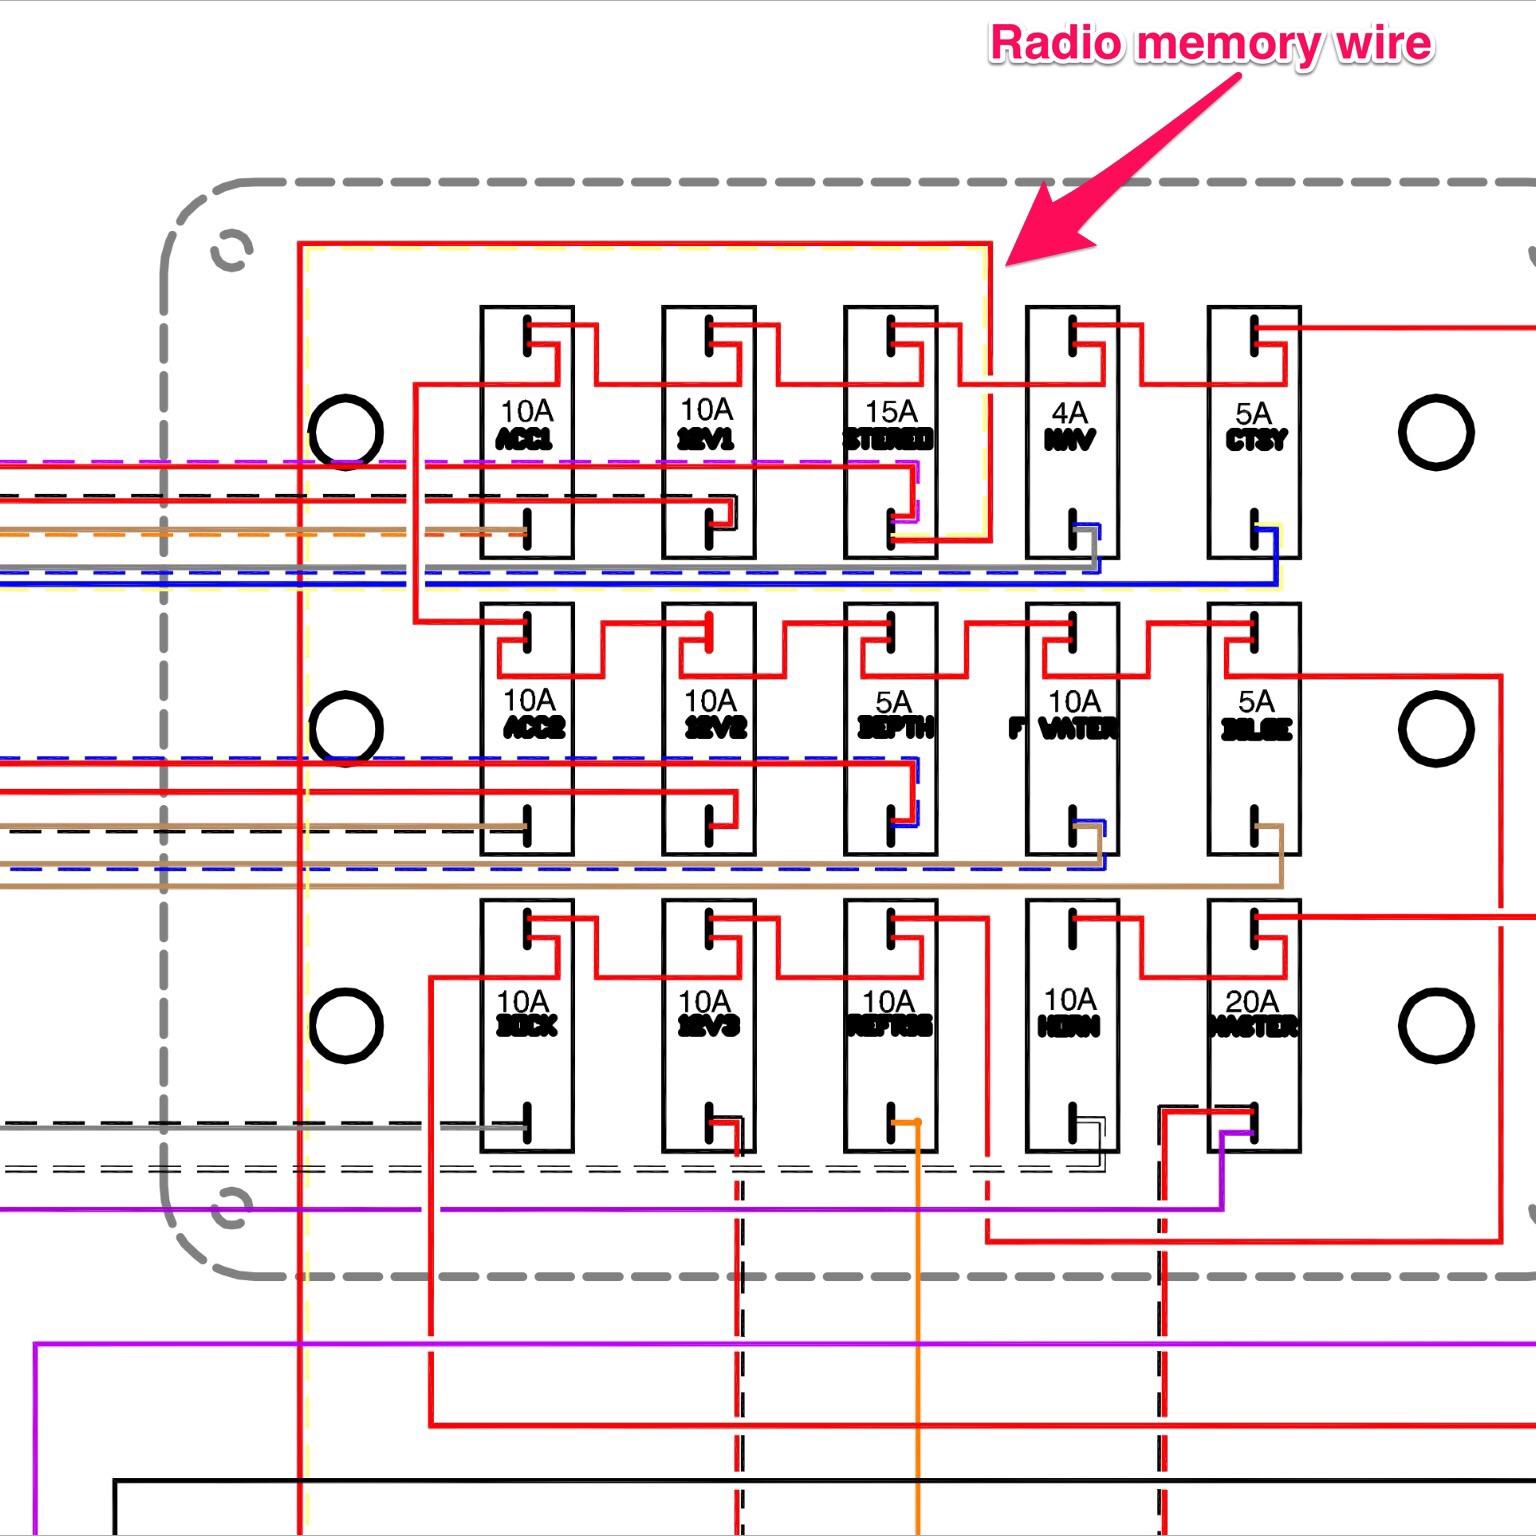 hight resolution of hurricane boat wiring diagram 29 wiring diagram images 2005 hurricane deck boat wiring diagram procraft boat